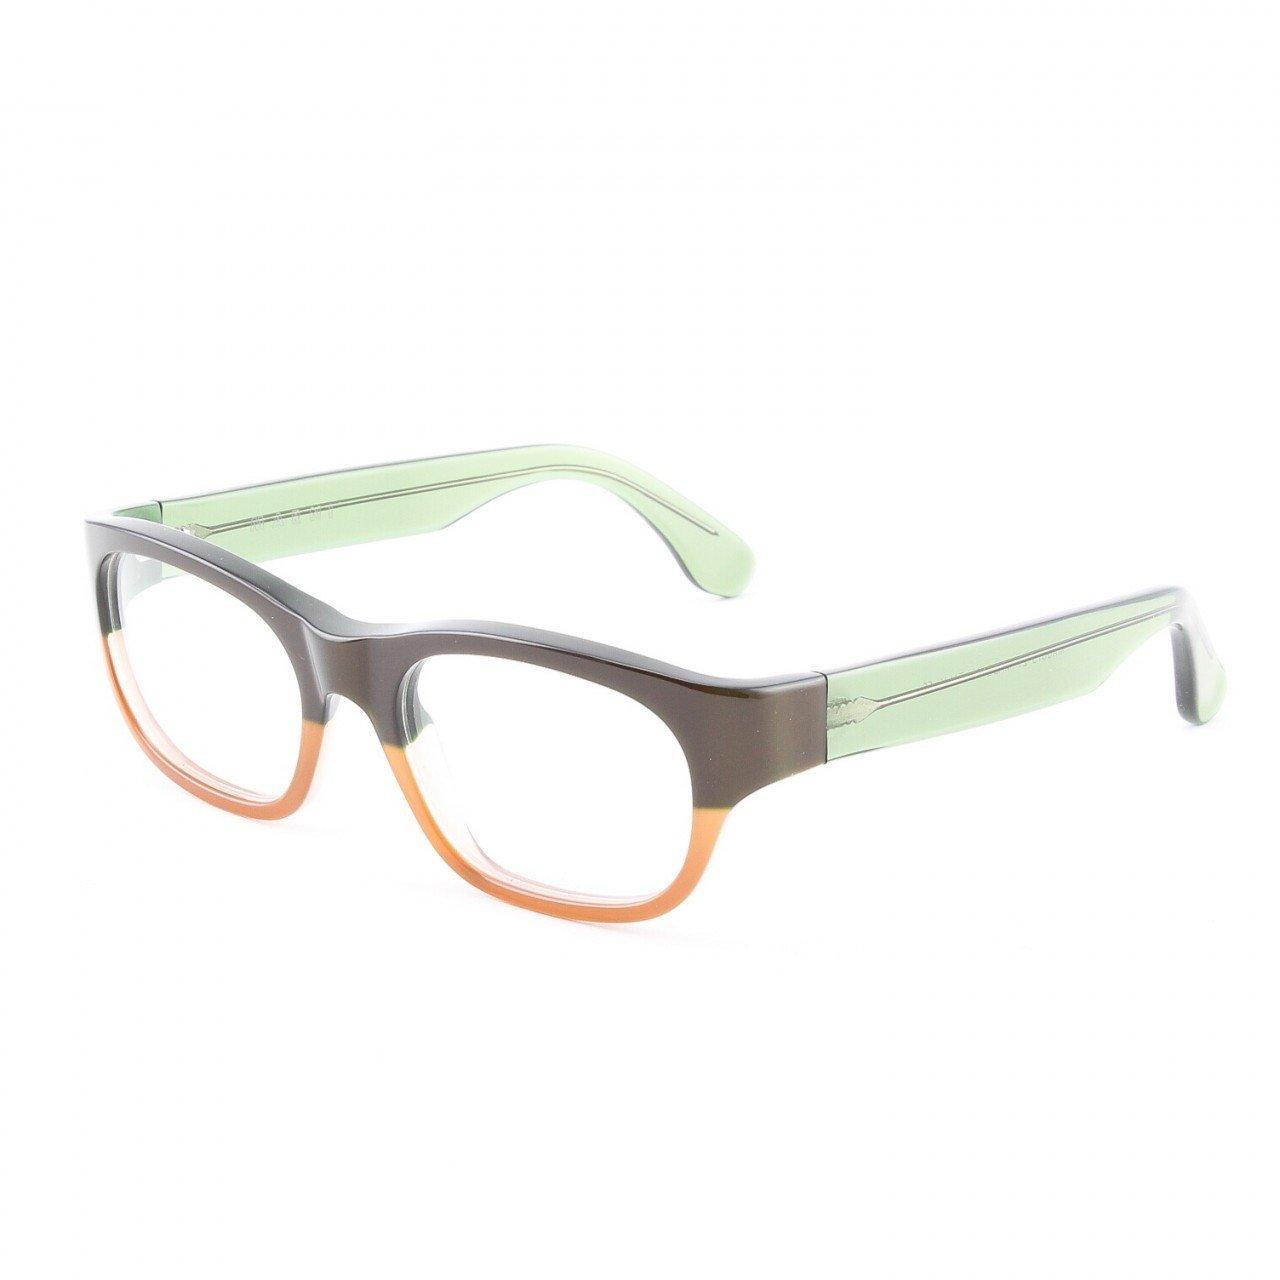 Marni MA601S Eyeglasses 27 Translucent Chocolate Brown with Demo Lenses